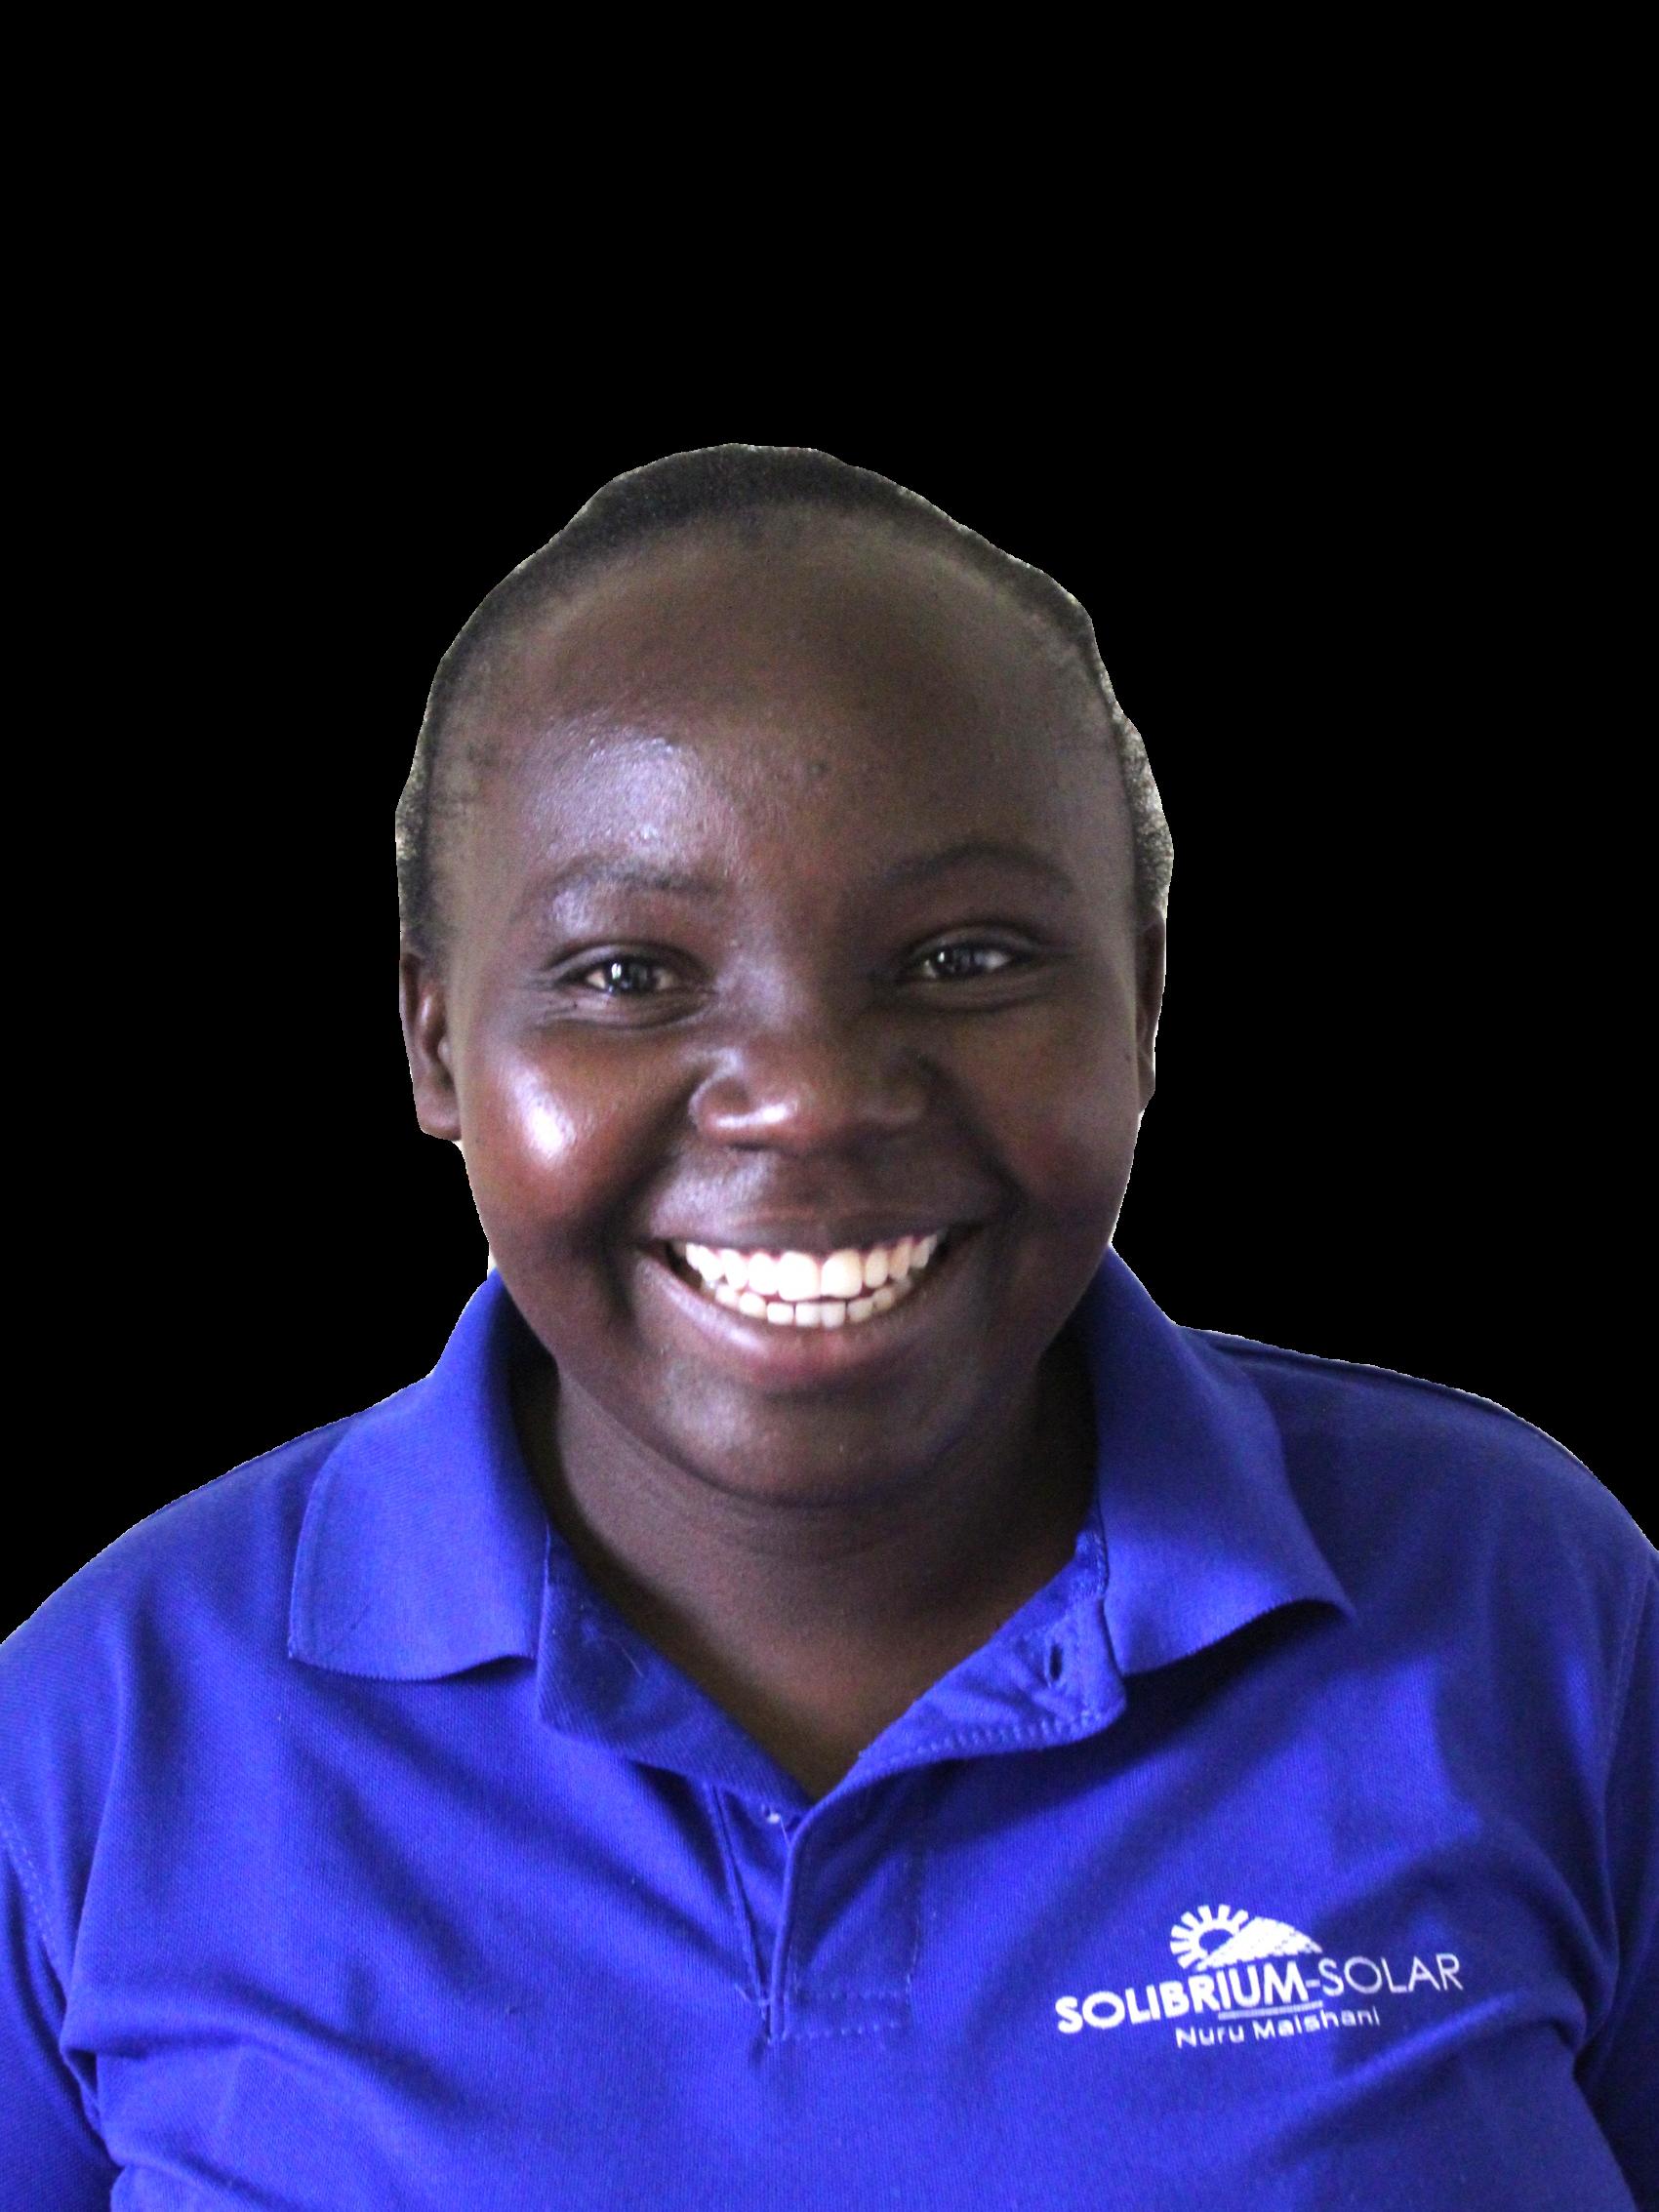 Gilfine Nyangasi